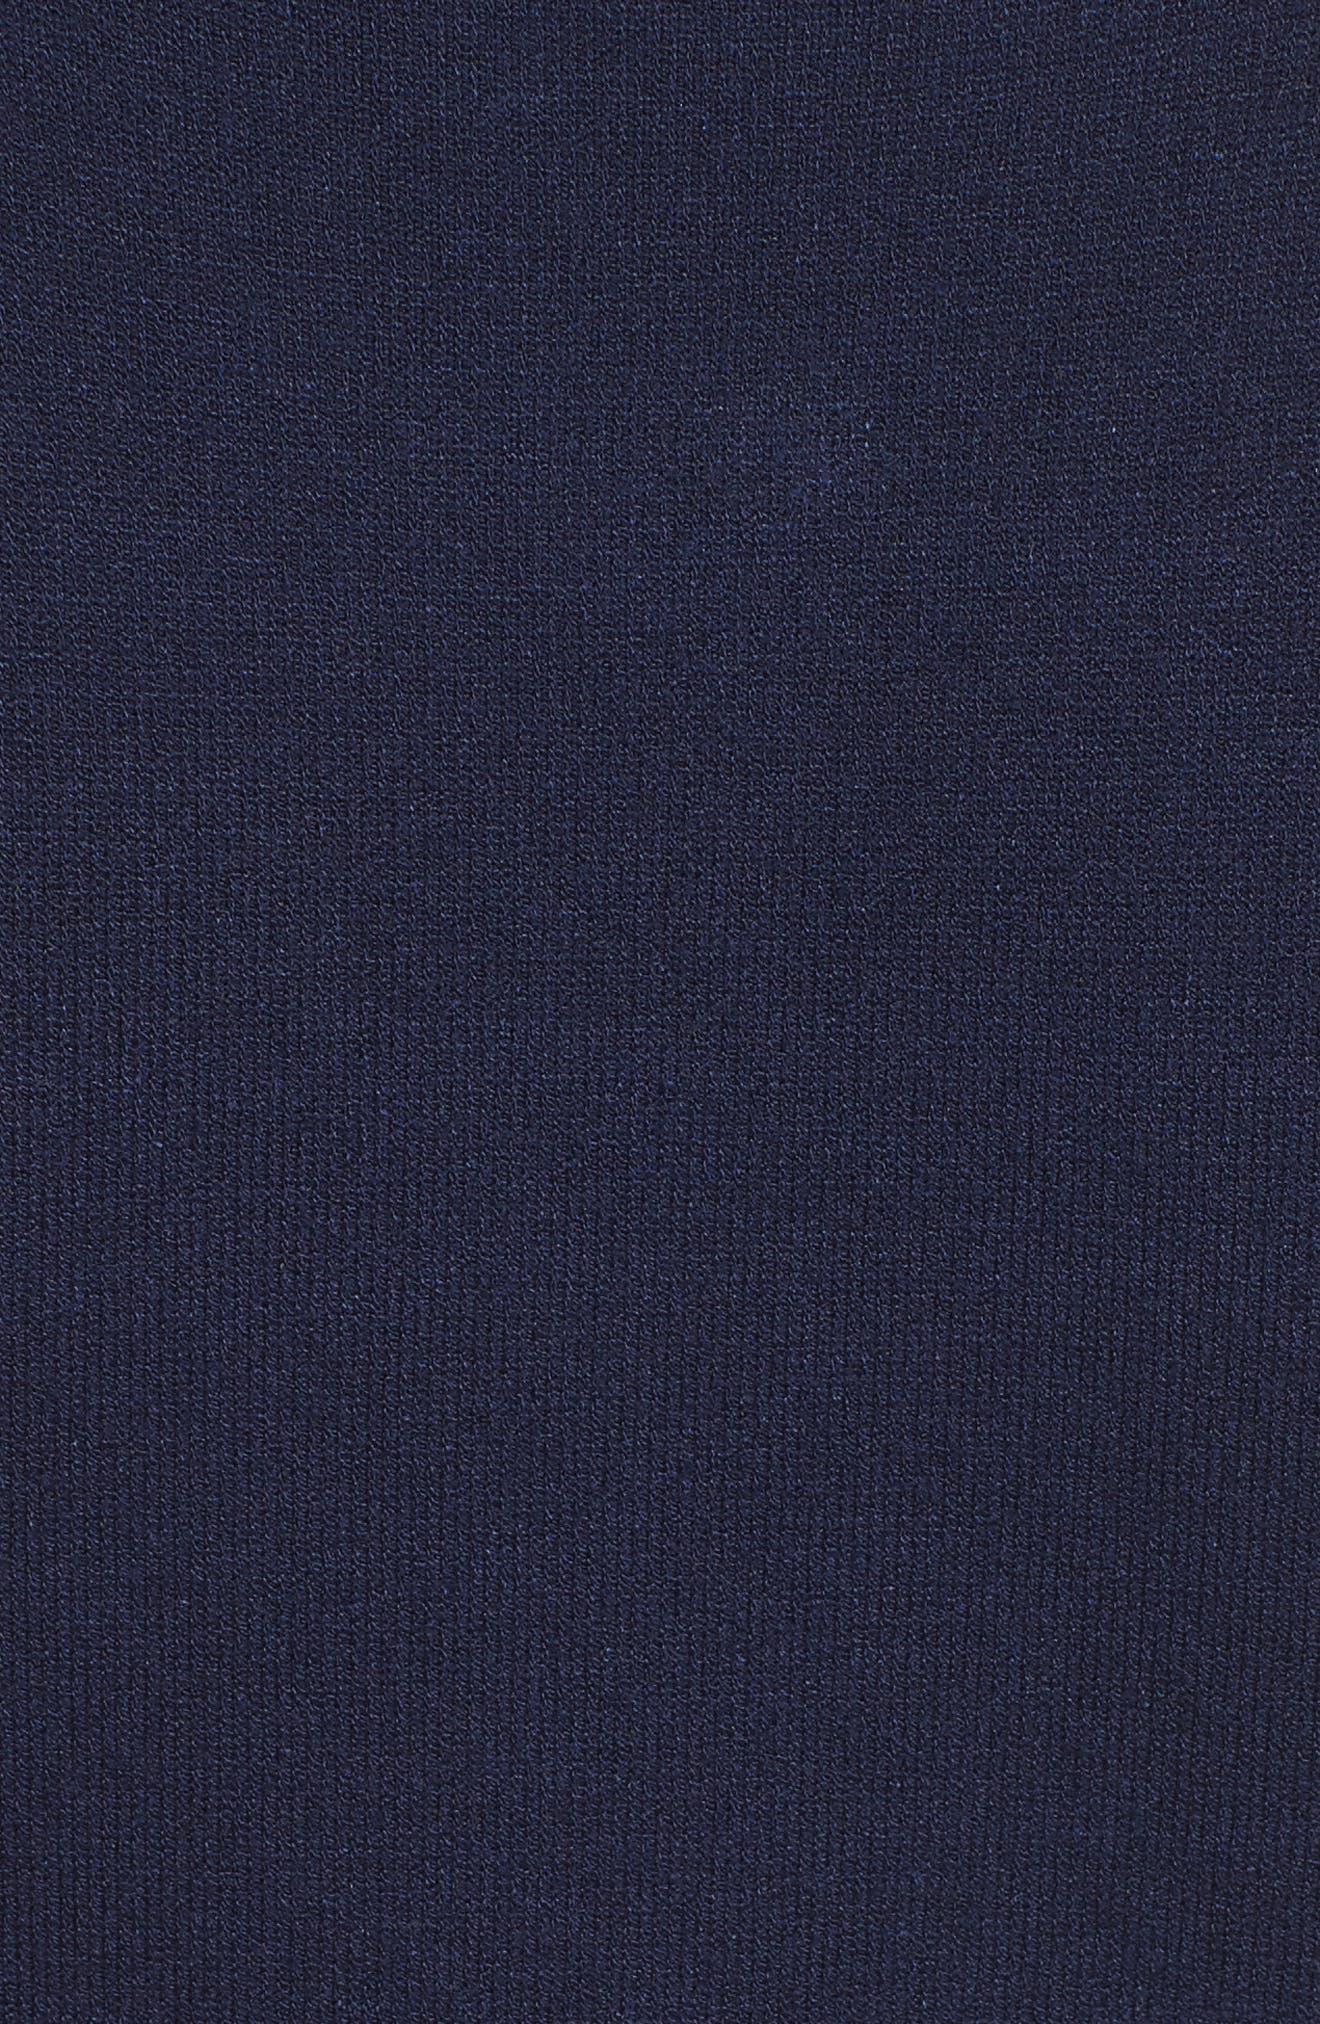 Twist Neck Stretch Knit Sheath Dress,                             Alternate thumbnail 5, color,                             Navy